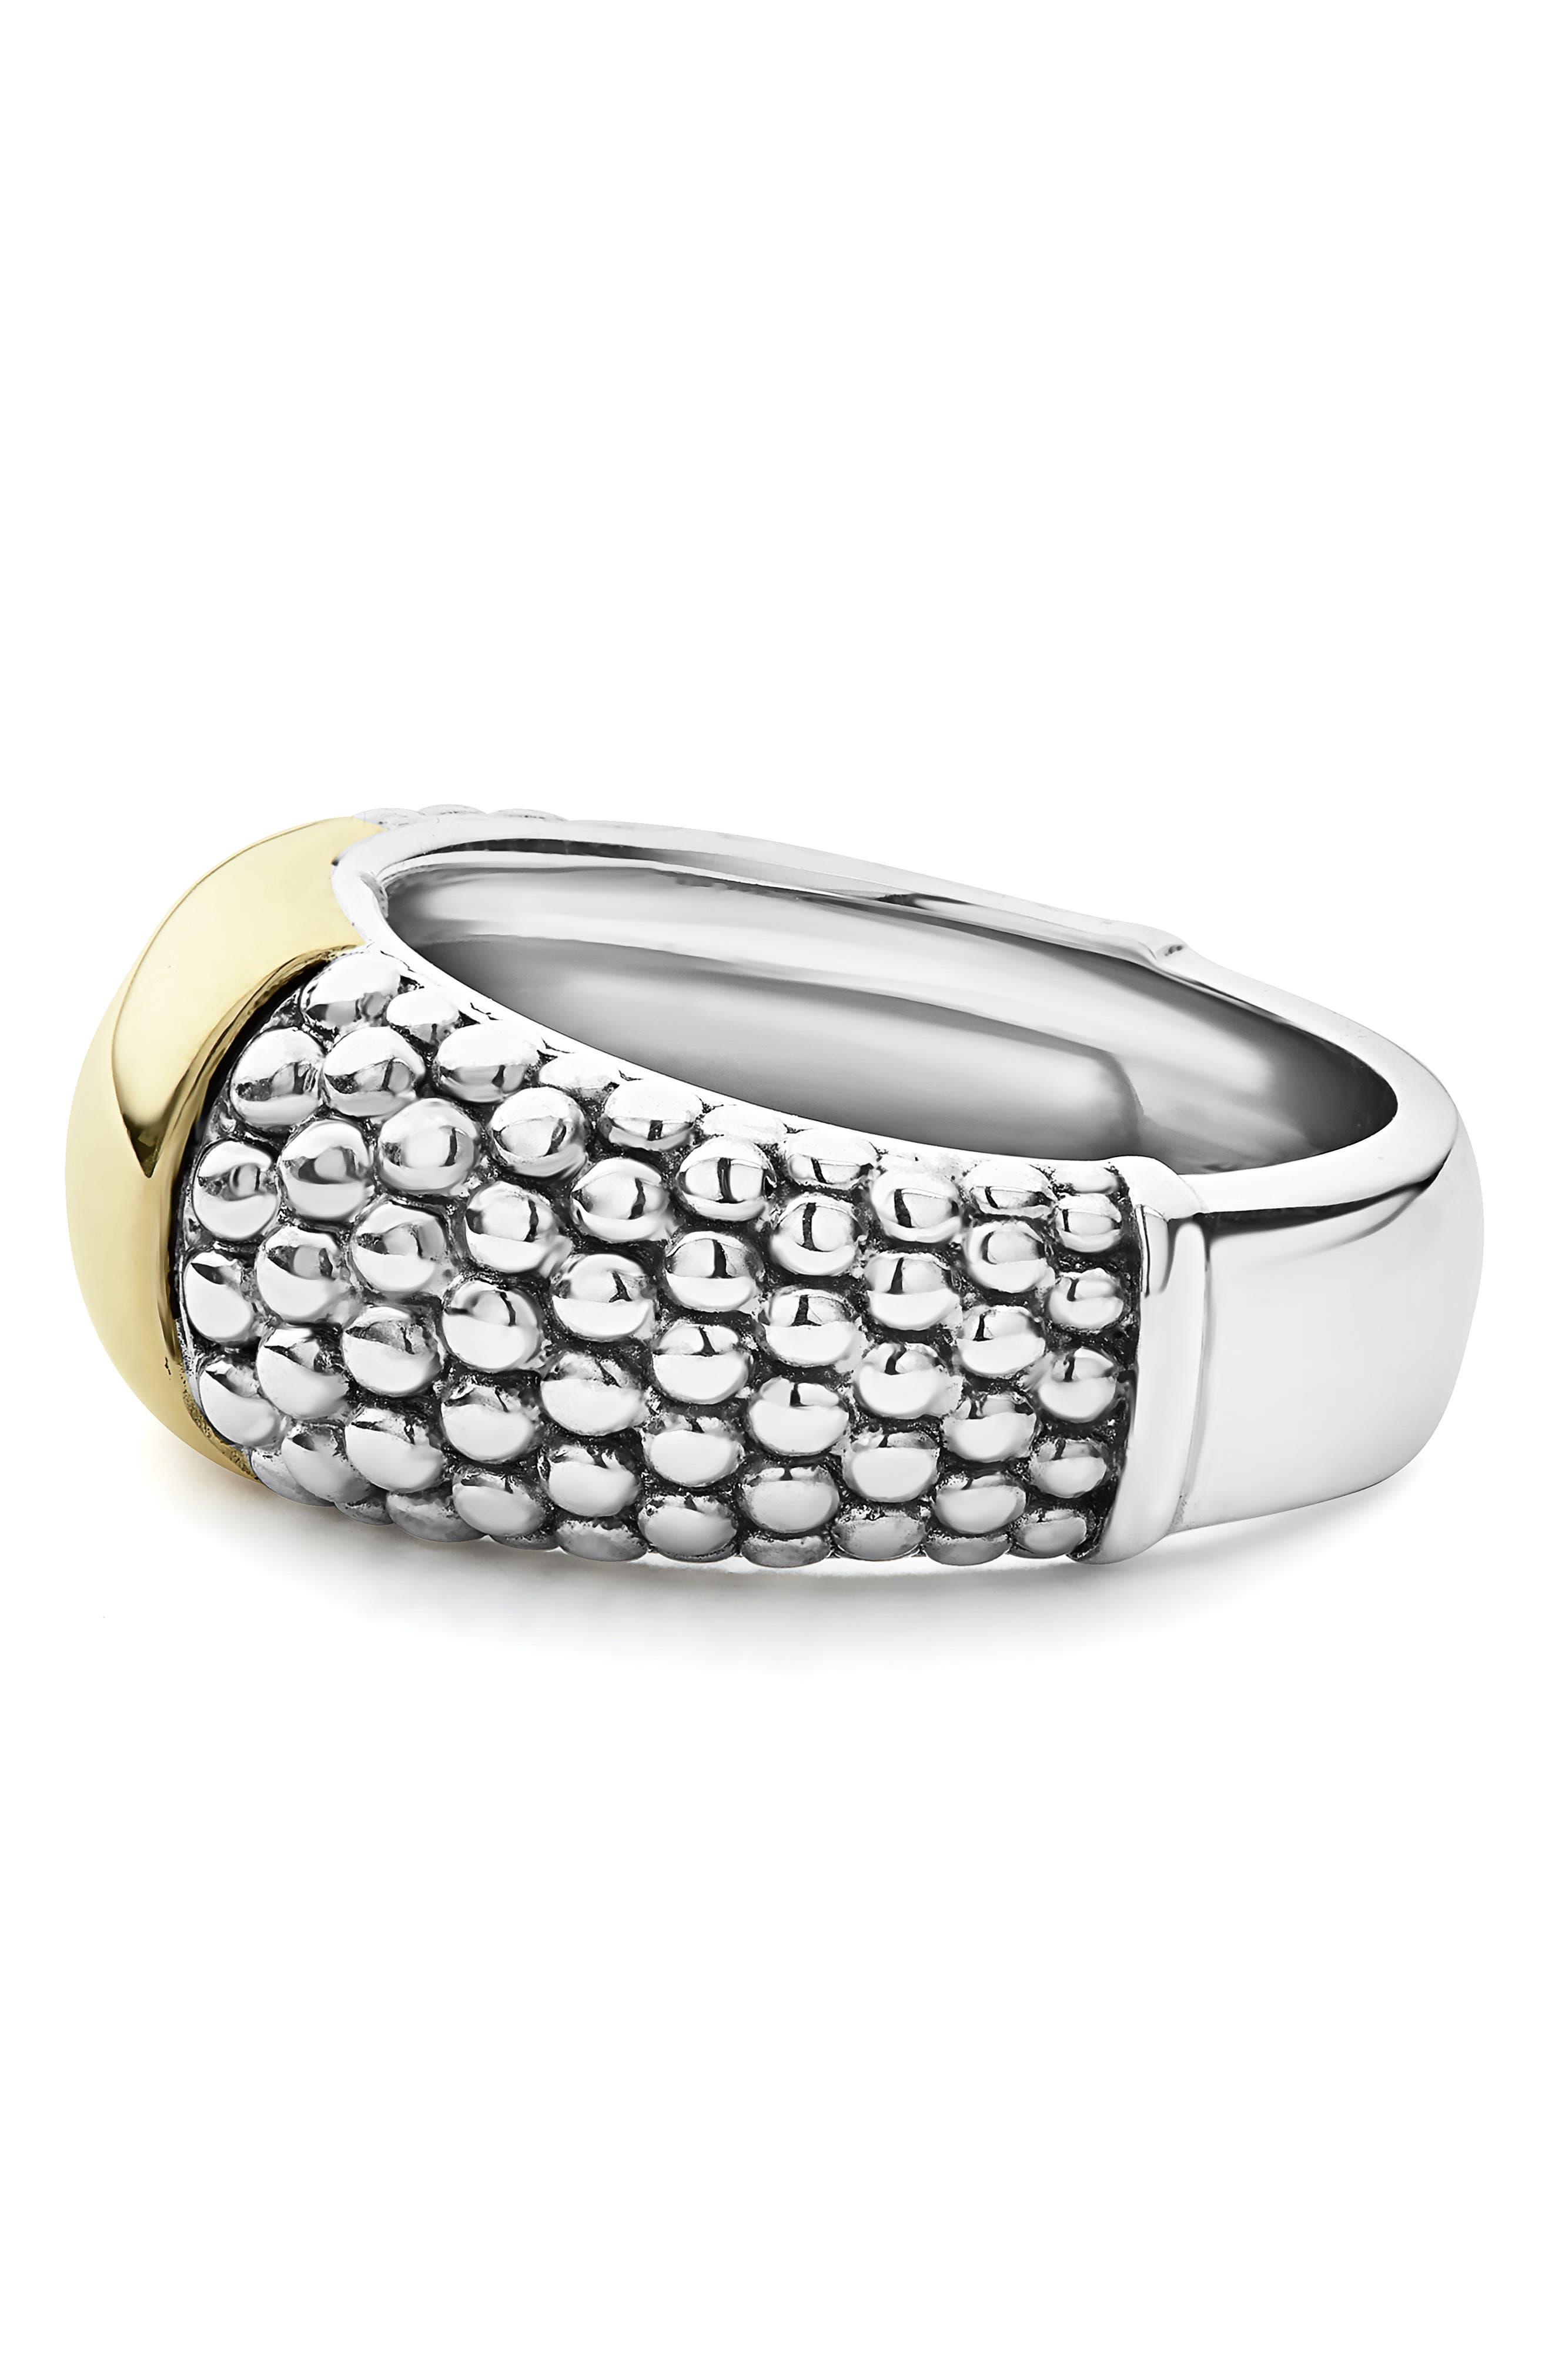 Signature Caviar High Bar Ring,                             Alternate thumbnail 3, color,                             SILVER/ GOLD